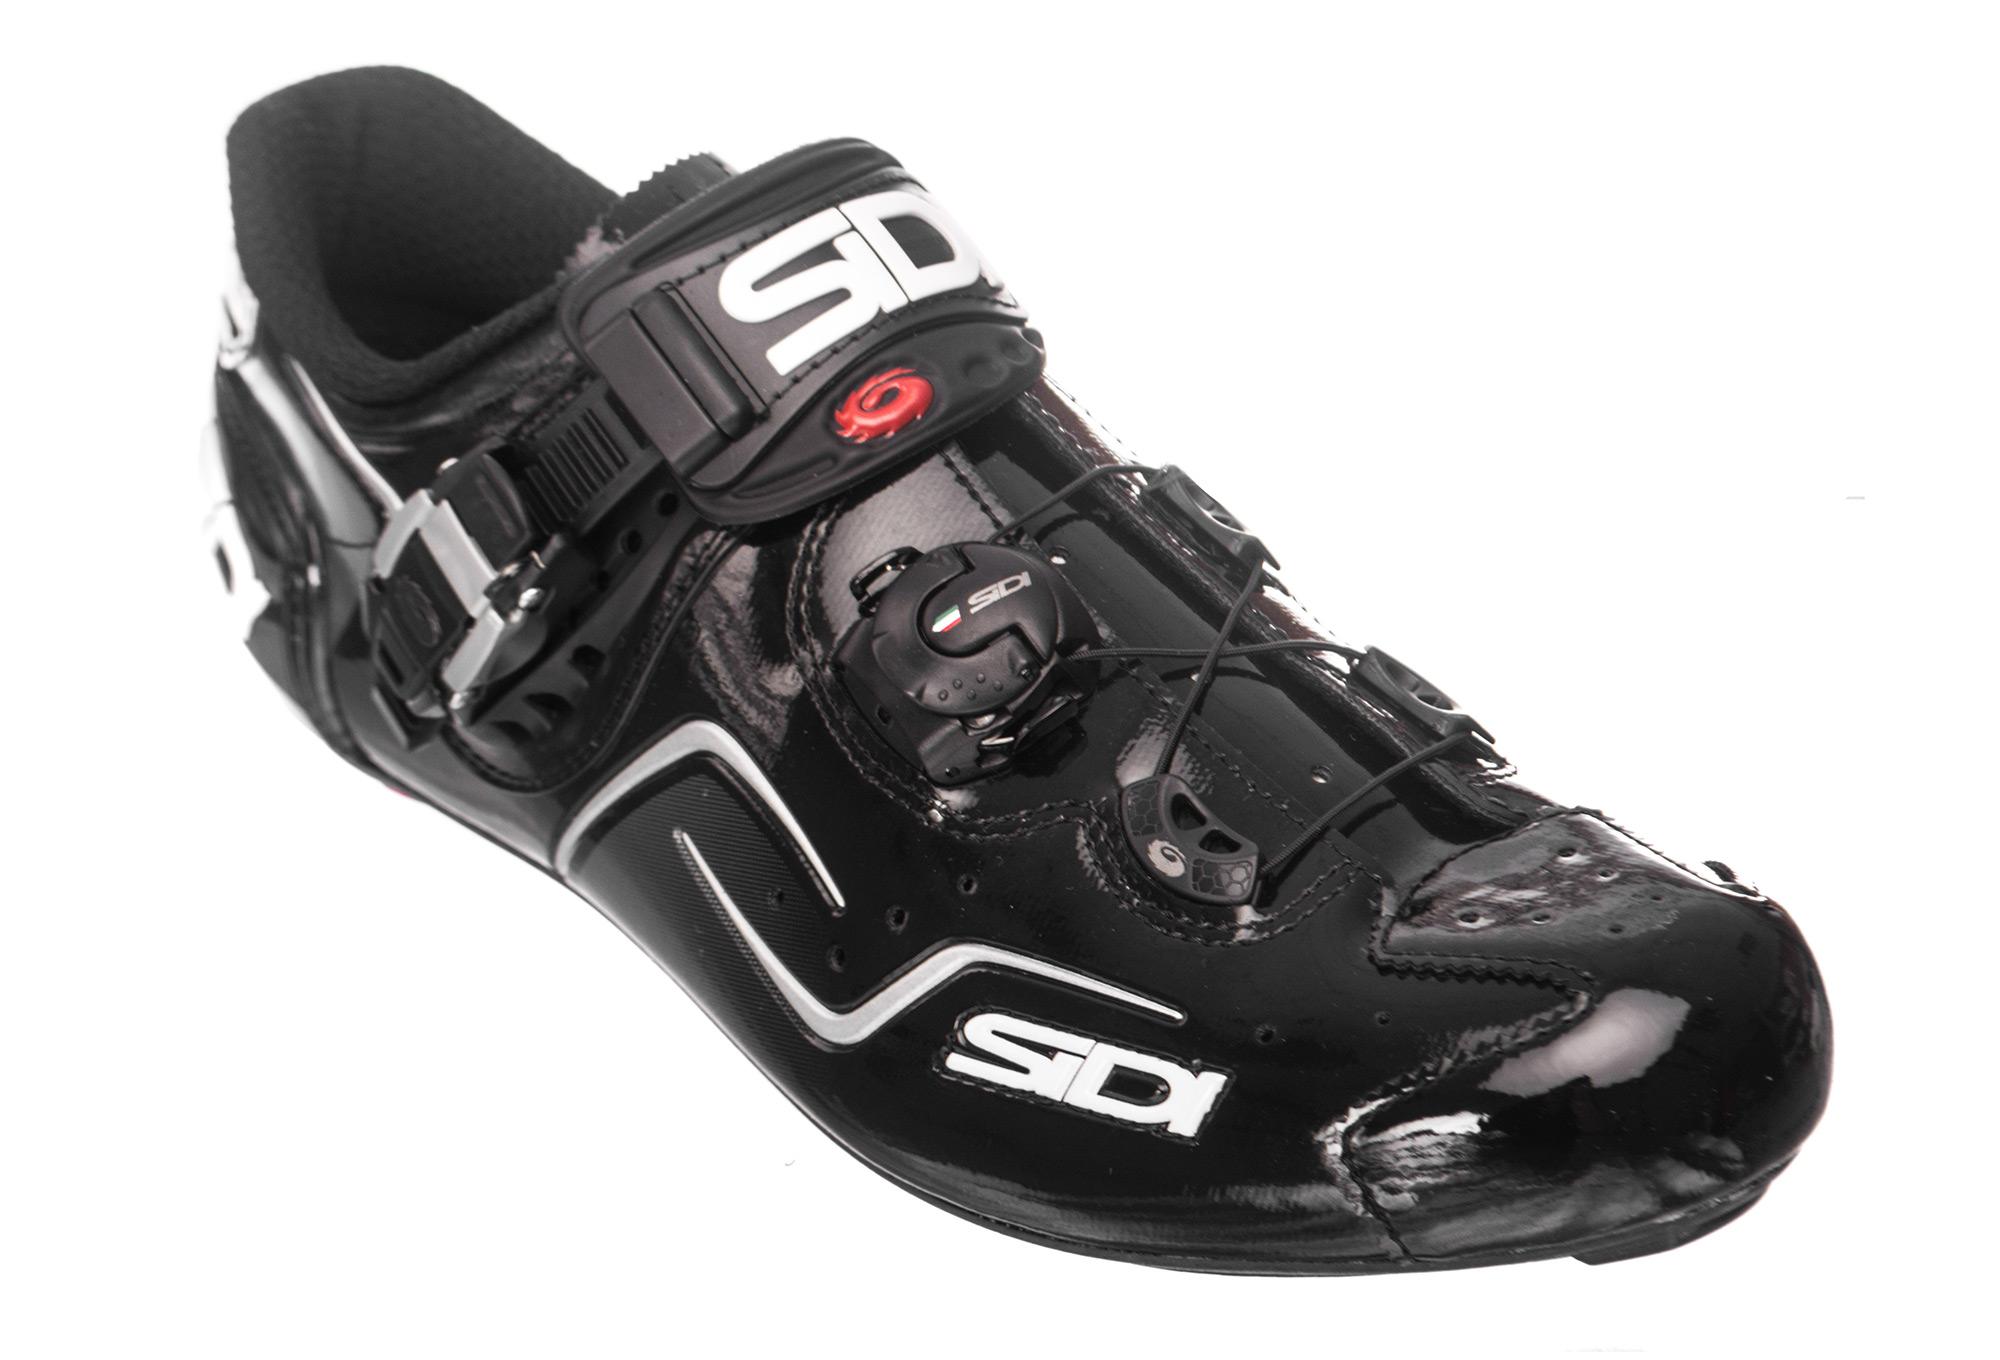 Sidi Kaos Road Shoes - Black Vernice